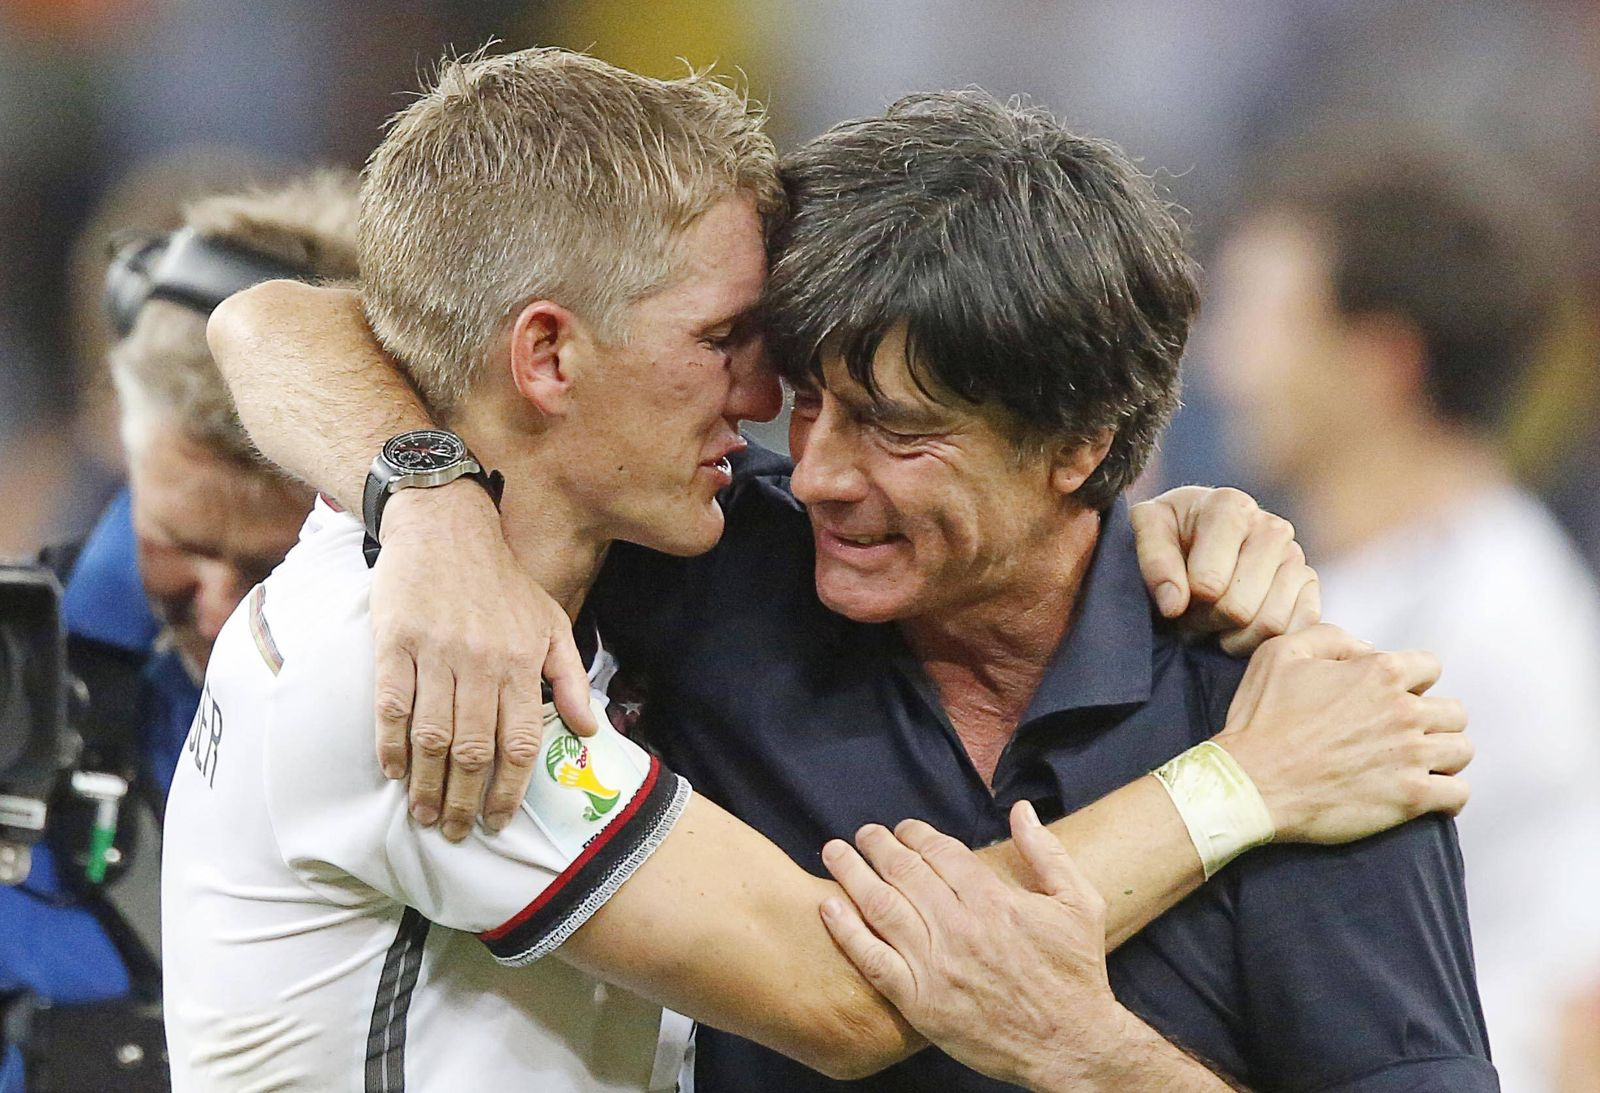 Bastian SCHWEINSTEIGER, DFB 7 DFB Bundestrainer Joachim Jogi Löw, LÖW,Traenen Umarmung Jubel DEUTSCHLAND FIFA Fussball